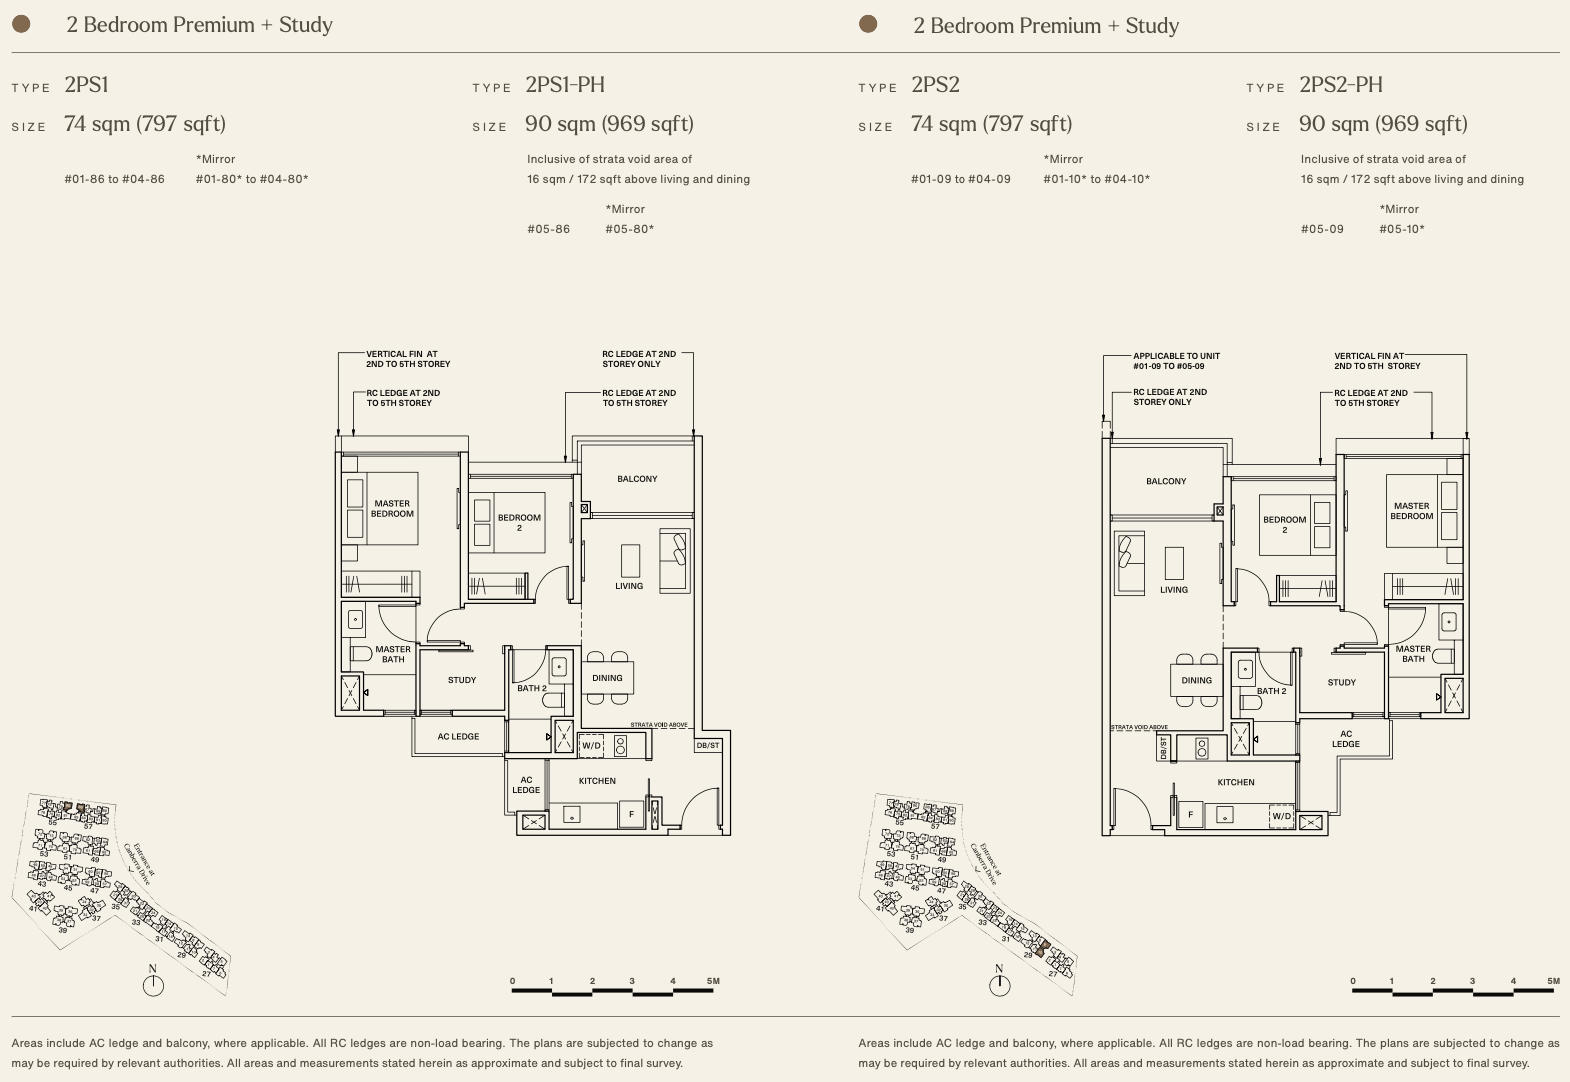 The Watergardens Floor Plans . 2BR Premium Study Type 2PS